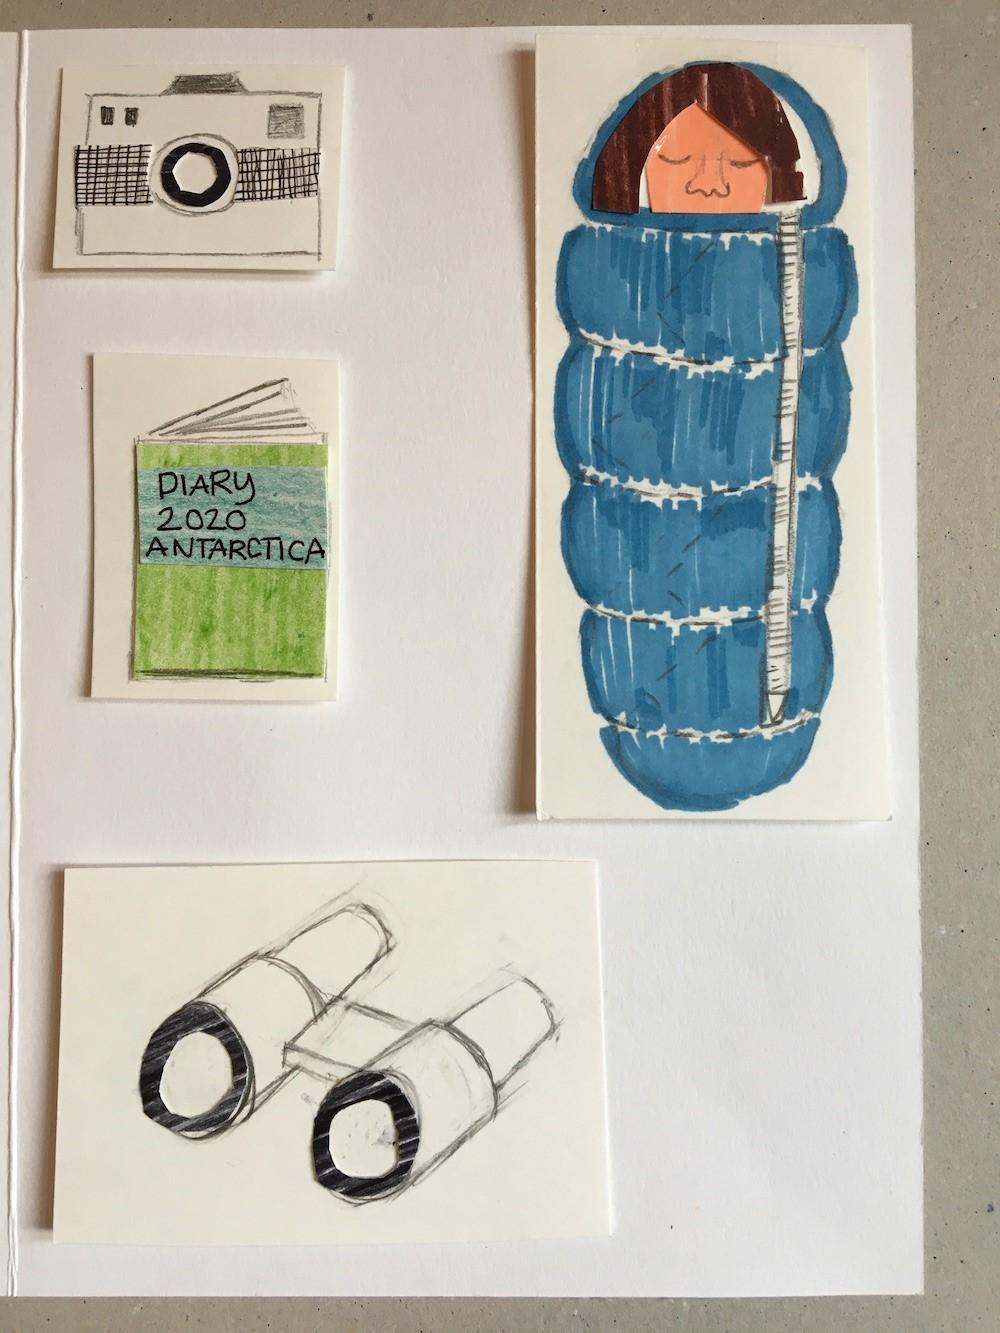 Drawings of a camera, diary, binoculars and a woman asleep in a sleeping bag